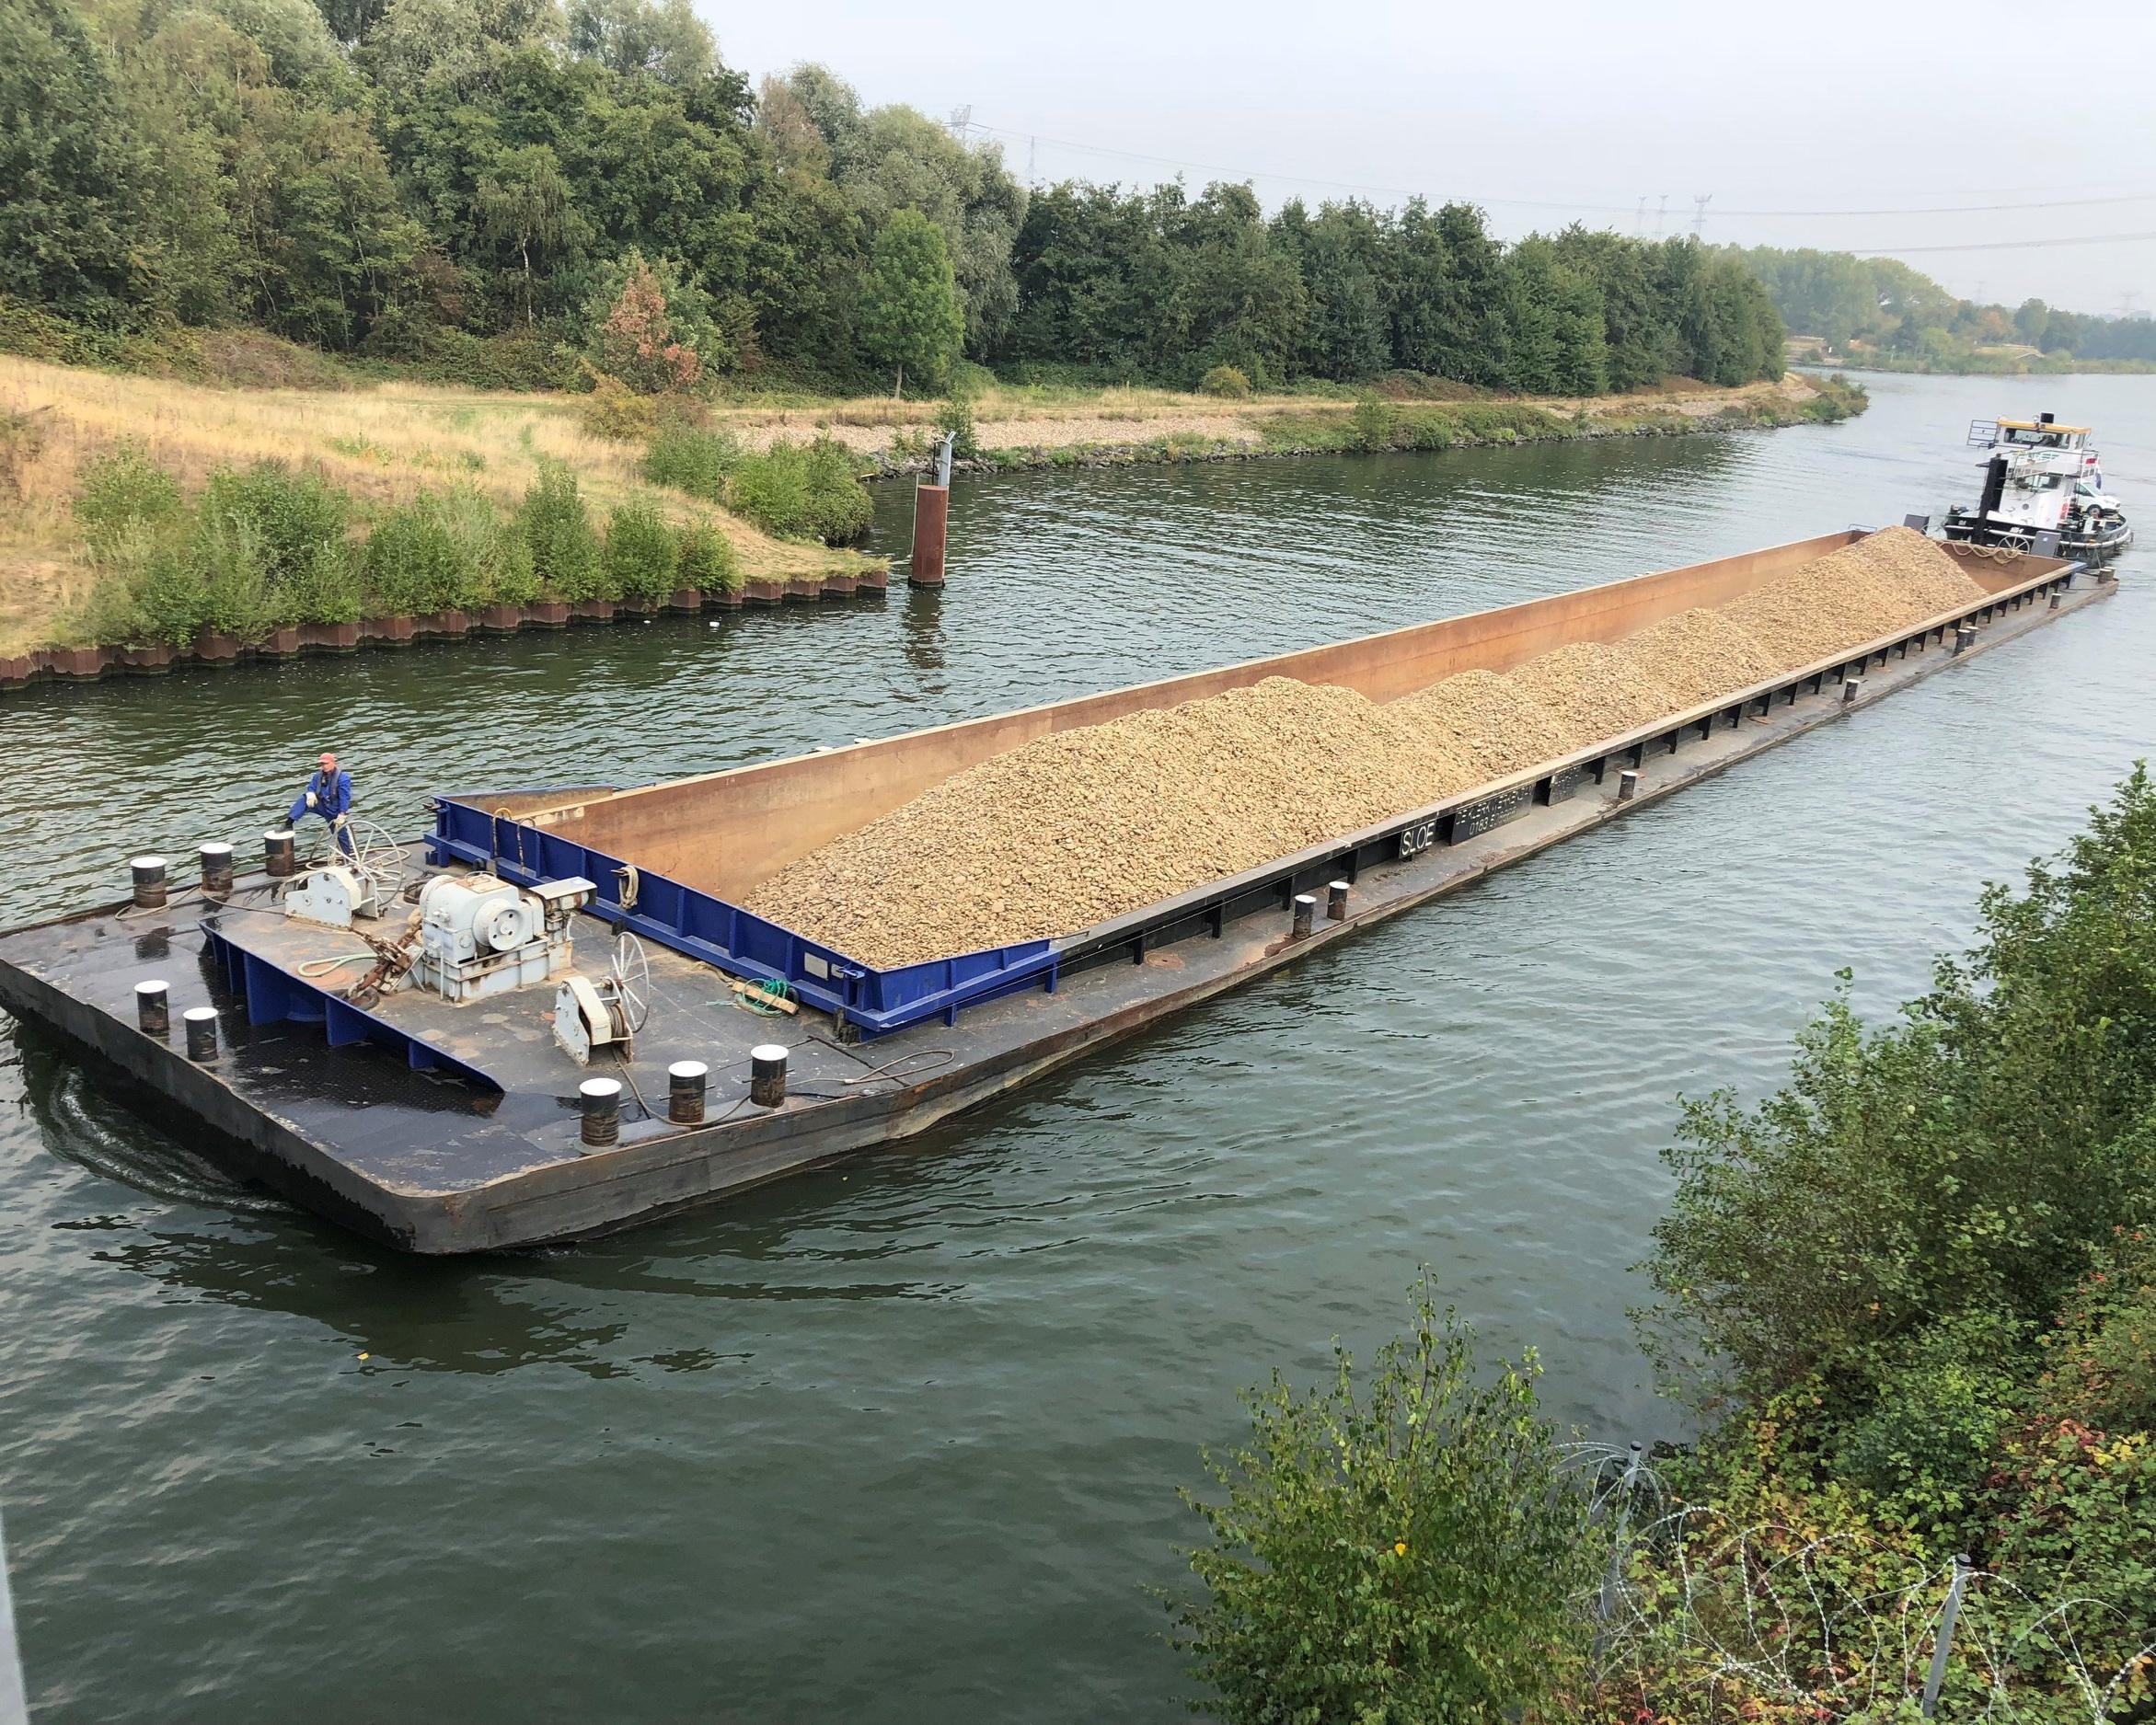 bevrachting_vrachtschip_fransbergen.jpg